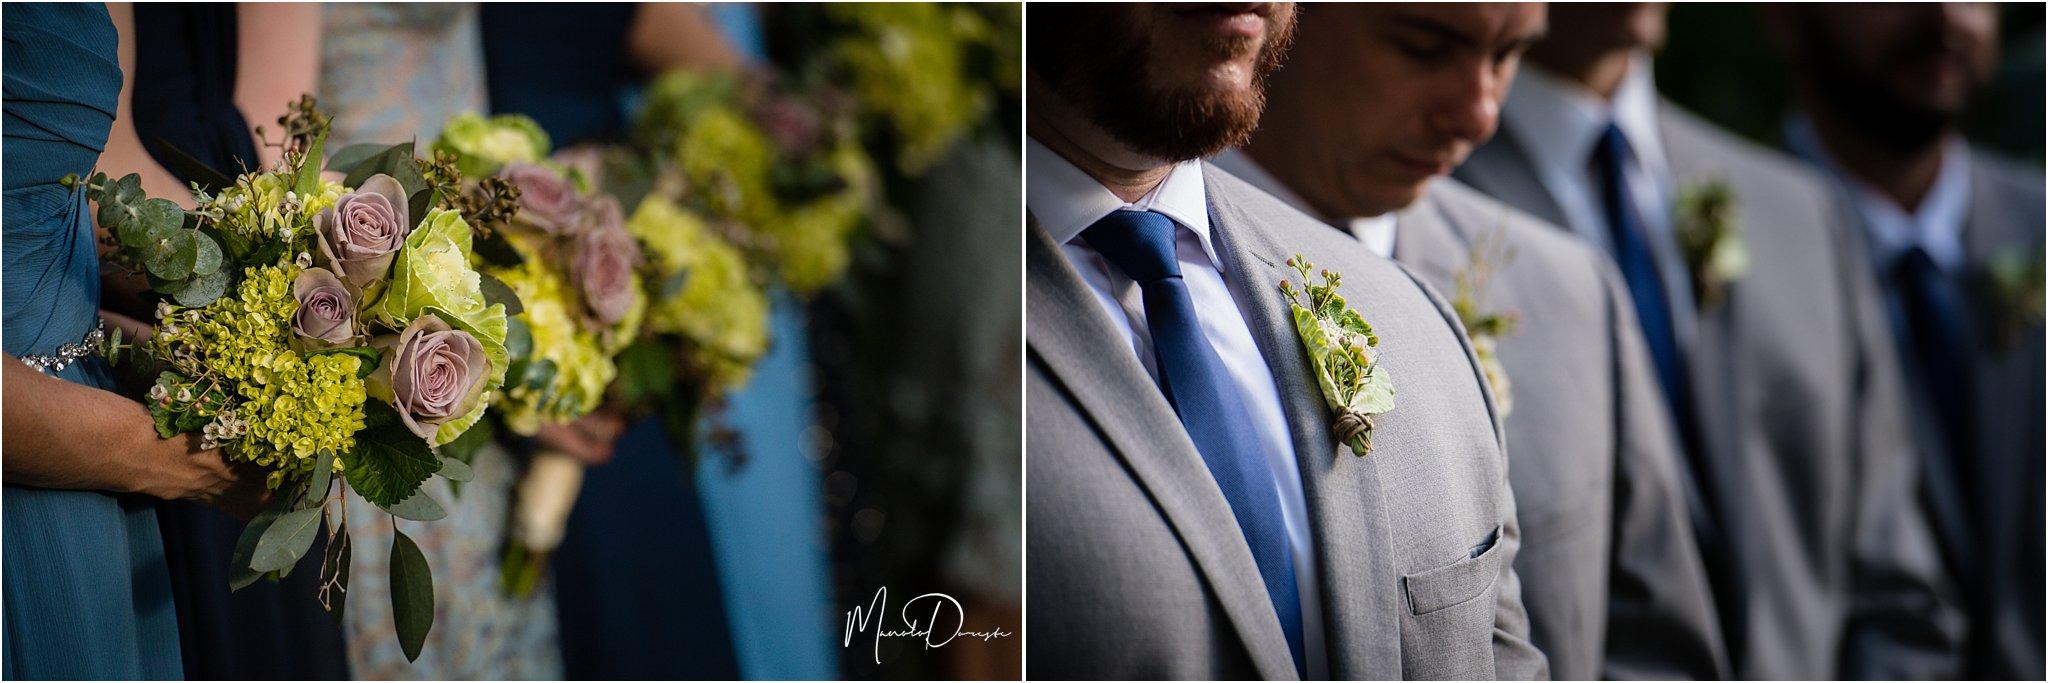 0519_ManoloDoreste_InFocusStudios_Wedding_Family_Photography_Miami_MiamiPhotographer.jpg